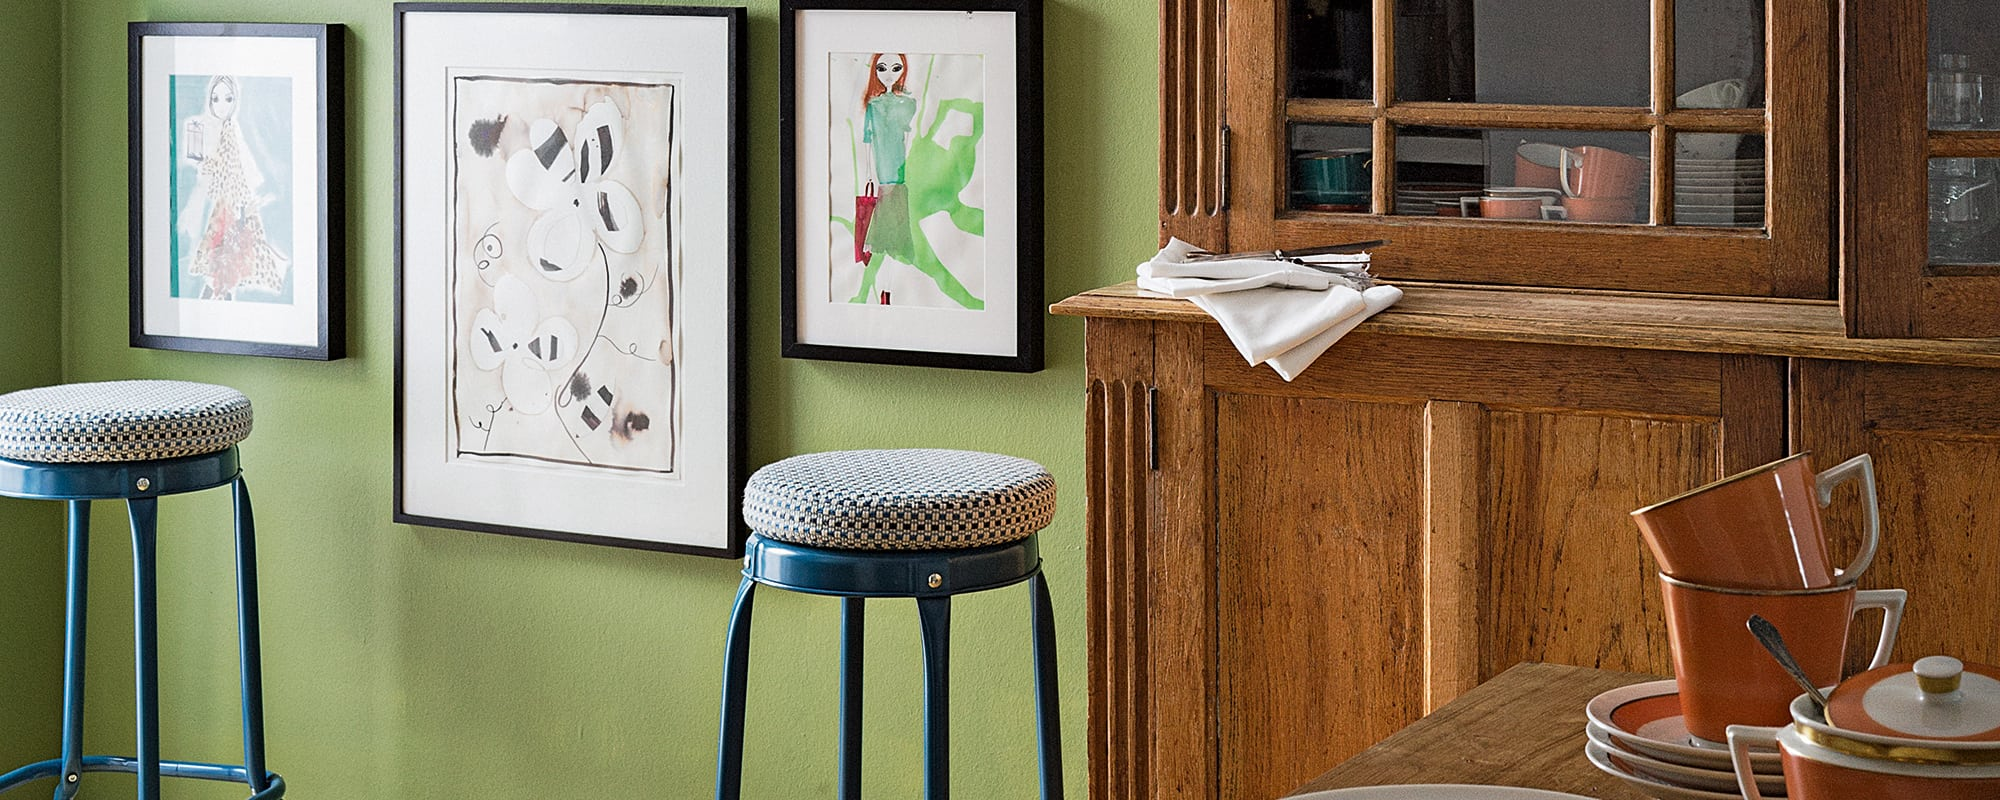 Küche, Hocker, Wandfarbe, Holz, Kommode